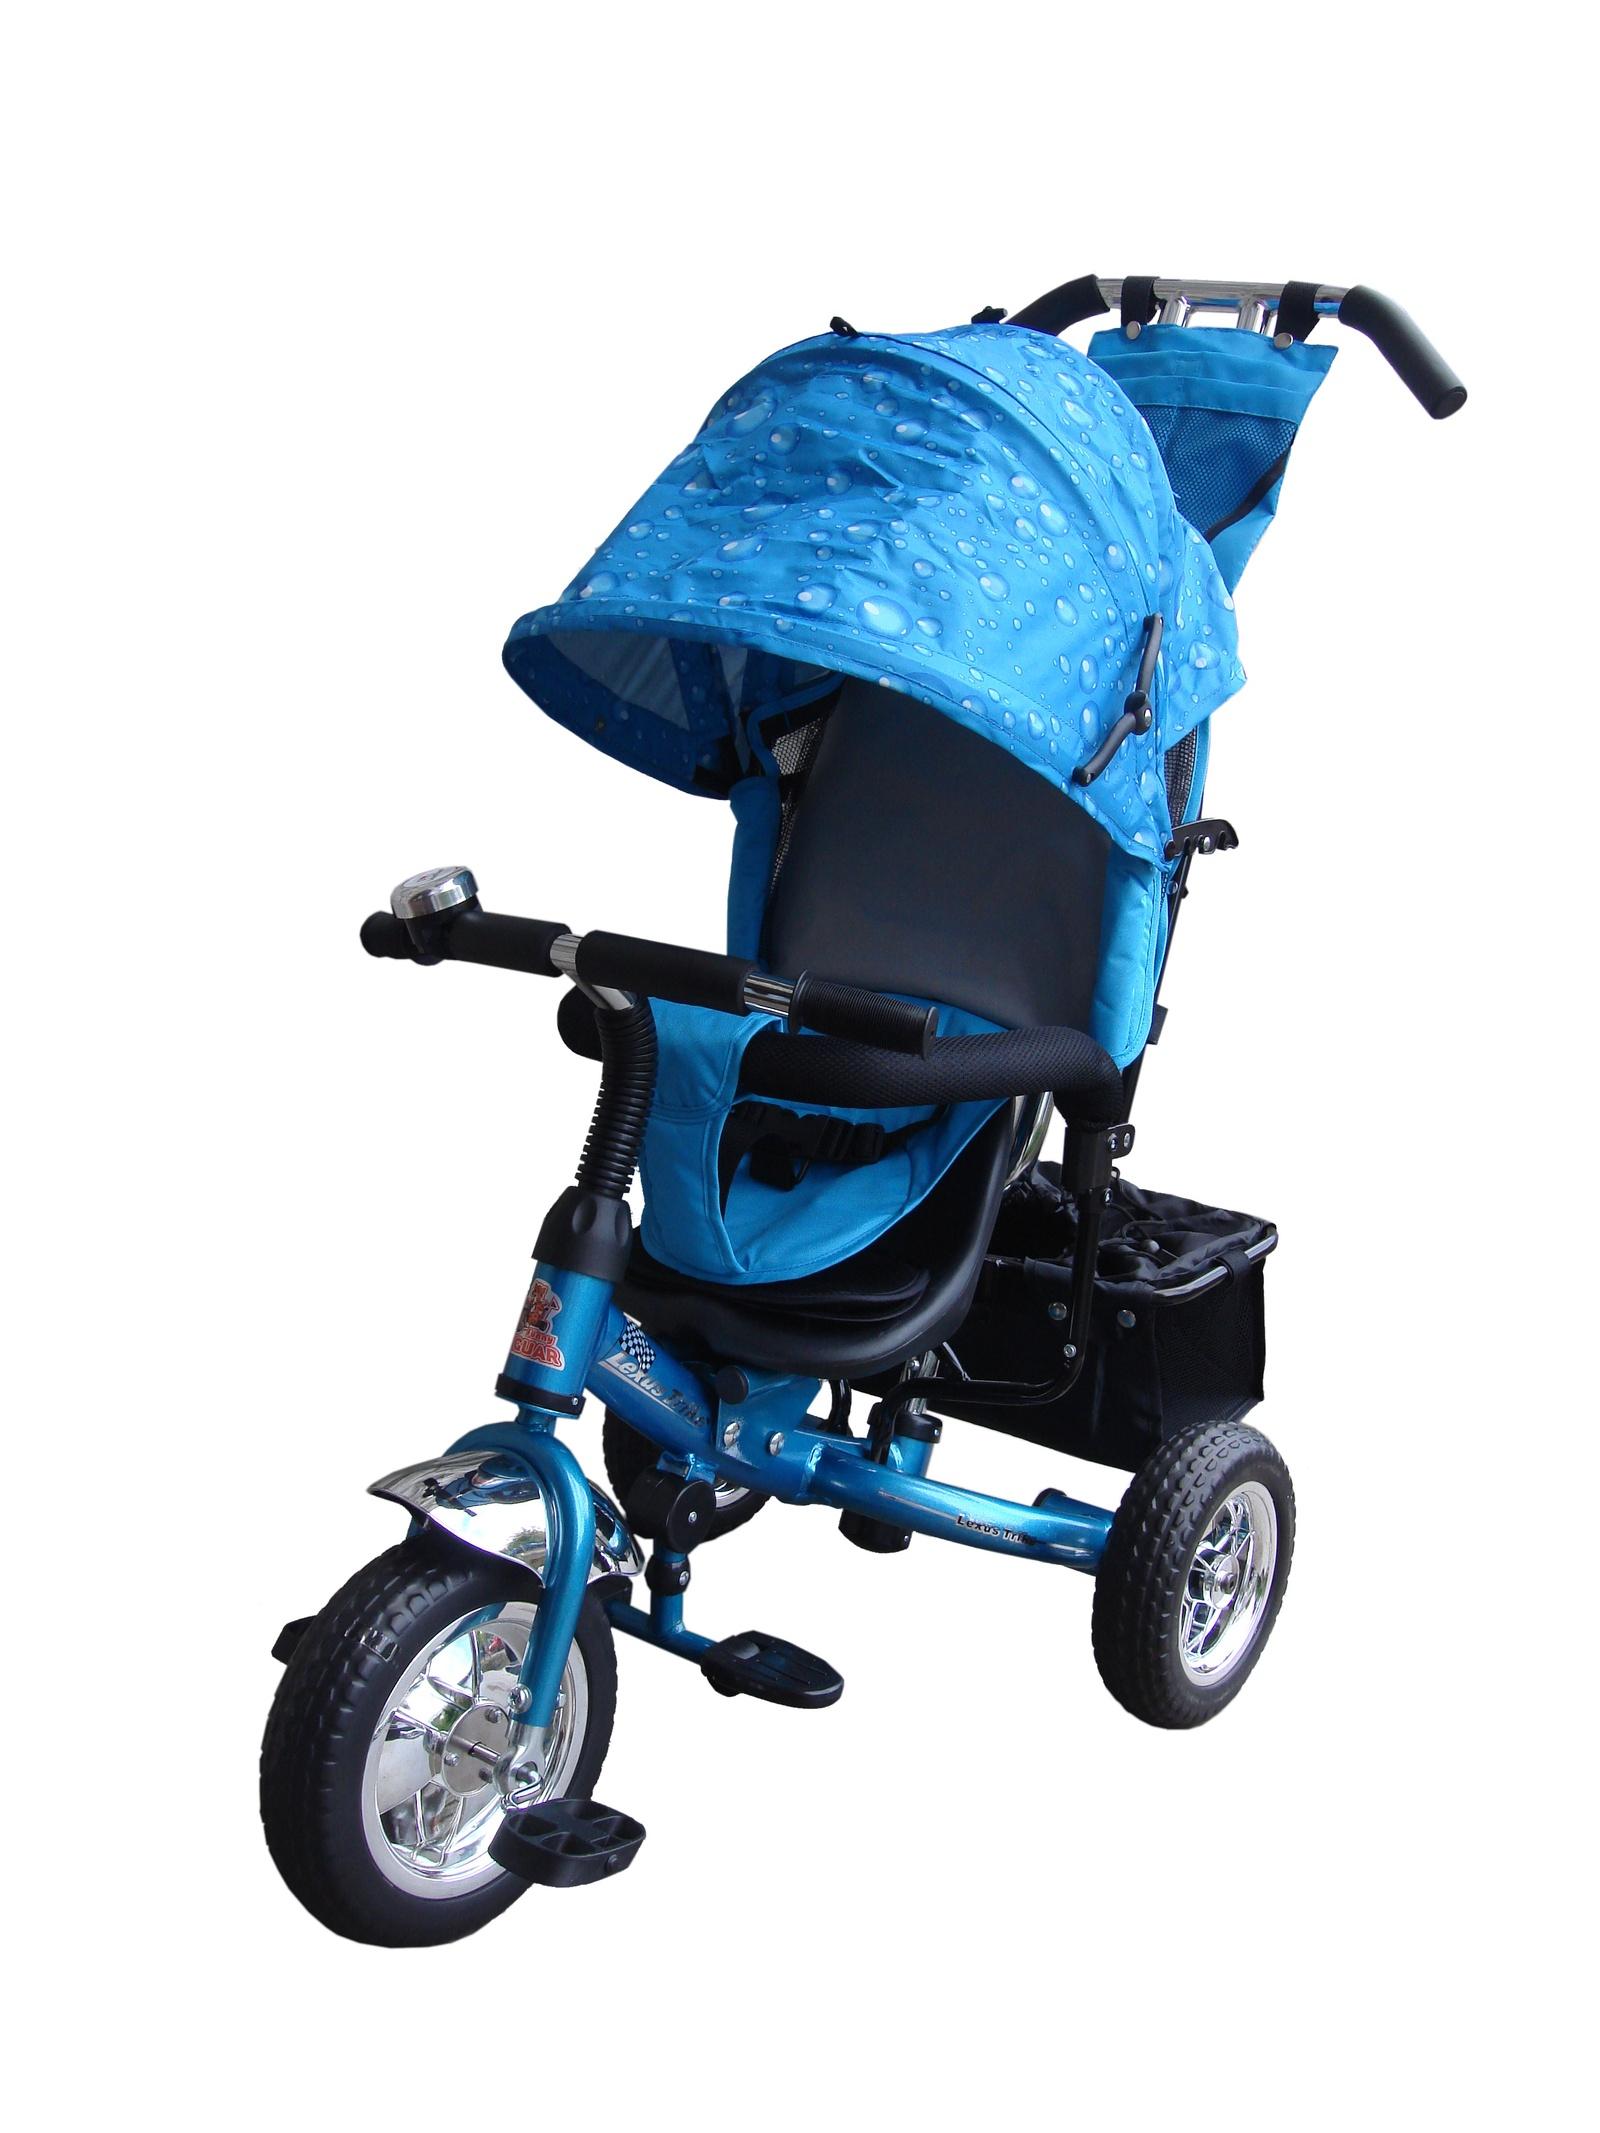 Велосипед Lexus Trike MS-0521, голубой